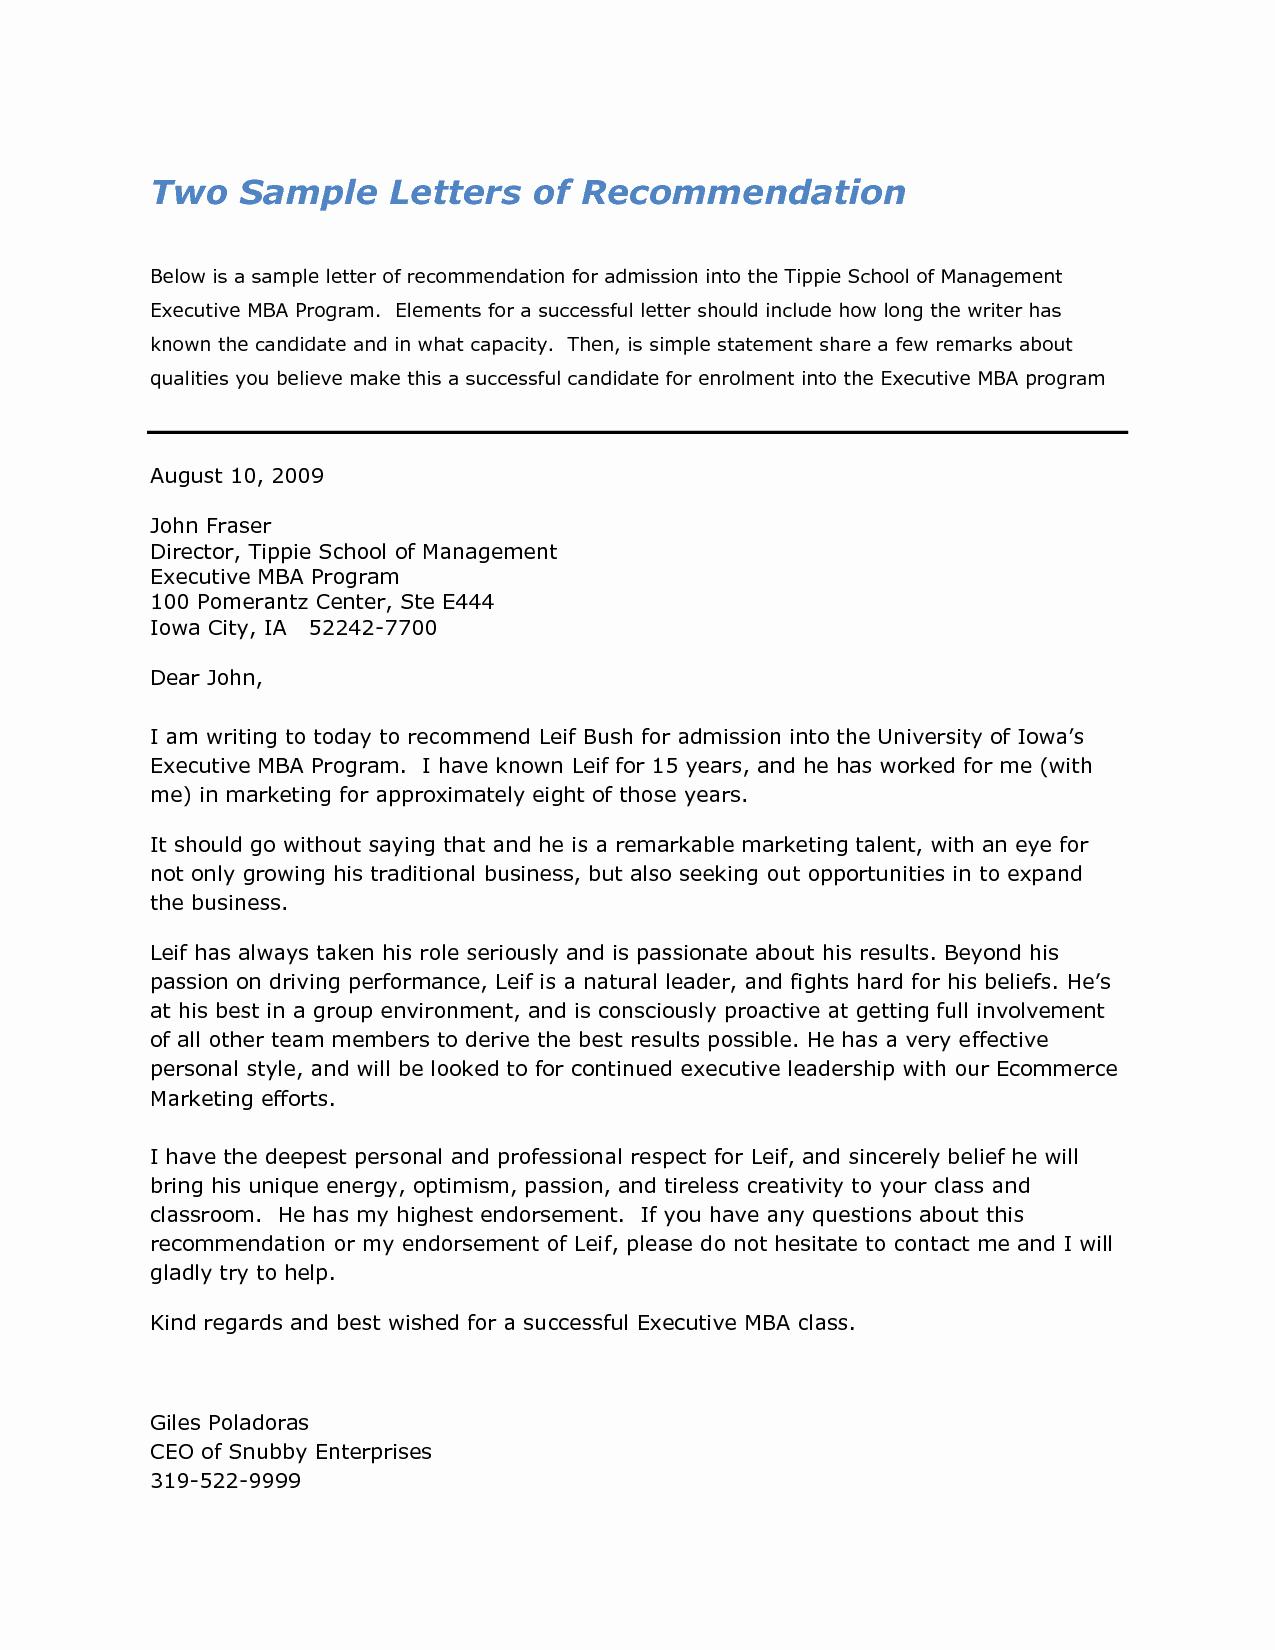 Sample Professional Letter Of Recommendation Inspirational Harvard Business School Letter Re Mendation Sample